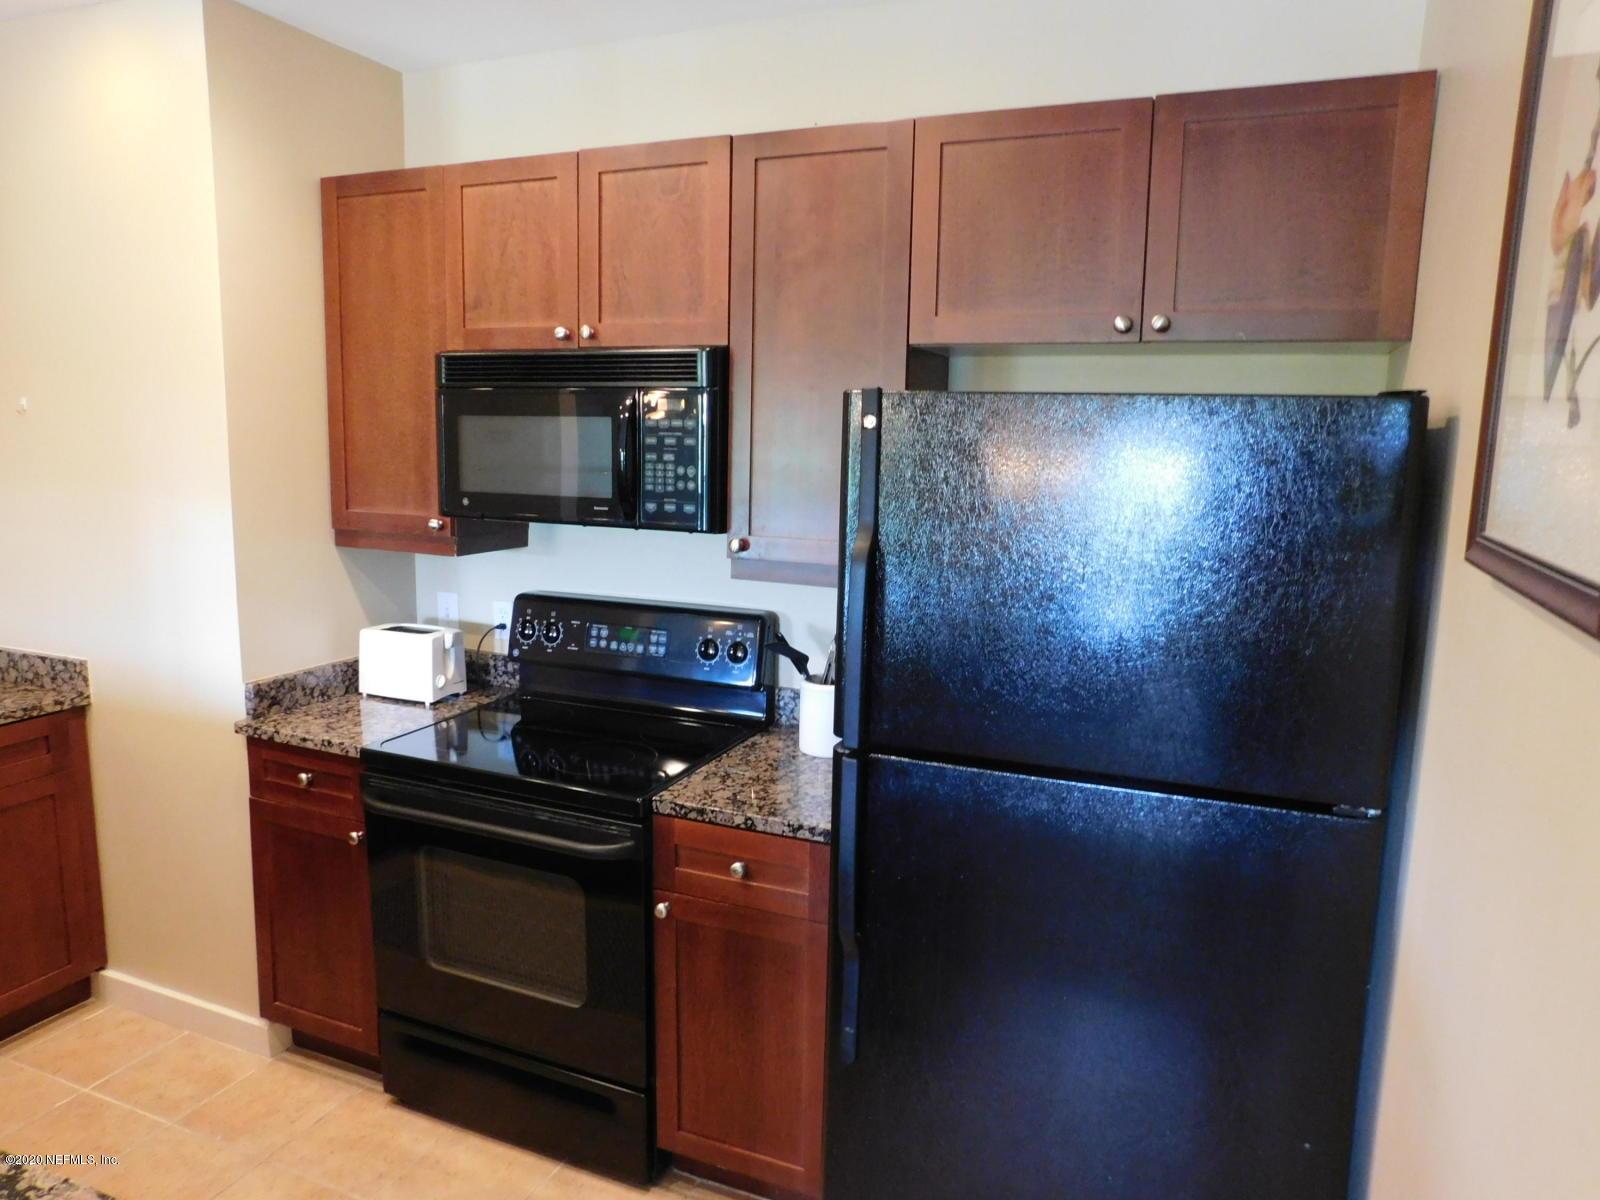 945 REGISTRY, ST AUGUSTINE, FLORIDA 32092, 1 Bedroom Bedrooms, ,1 BathroomBathrooms,Rental,For Rent,REGISTRY,1072011